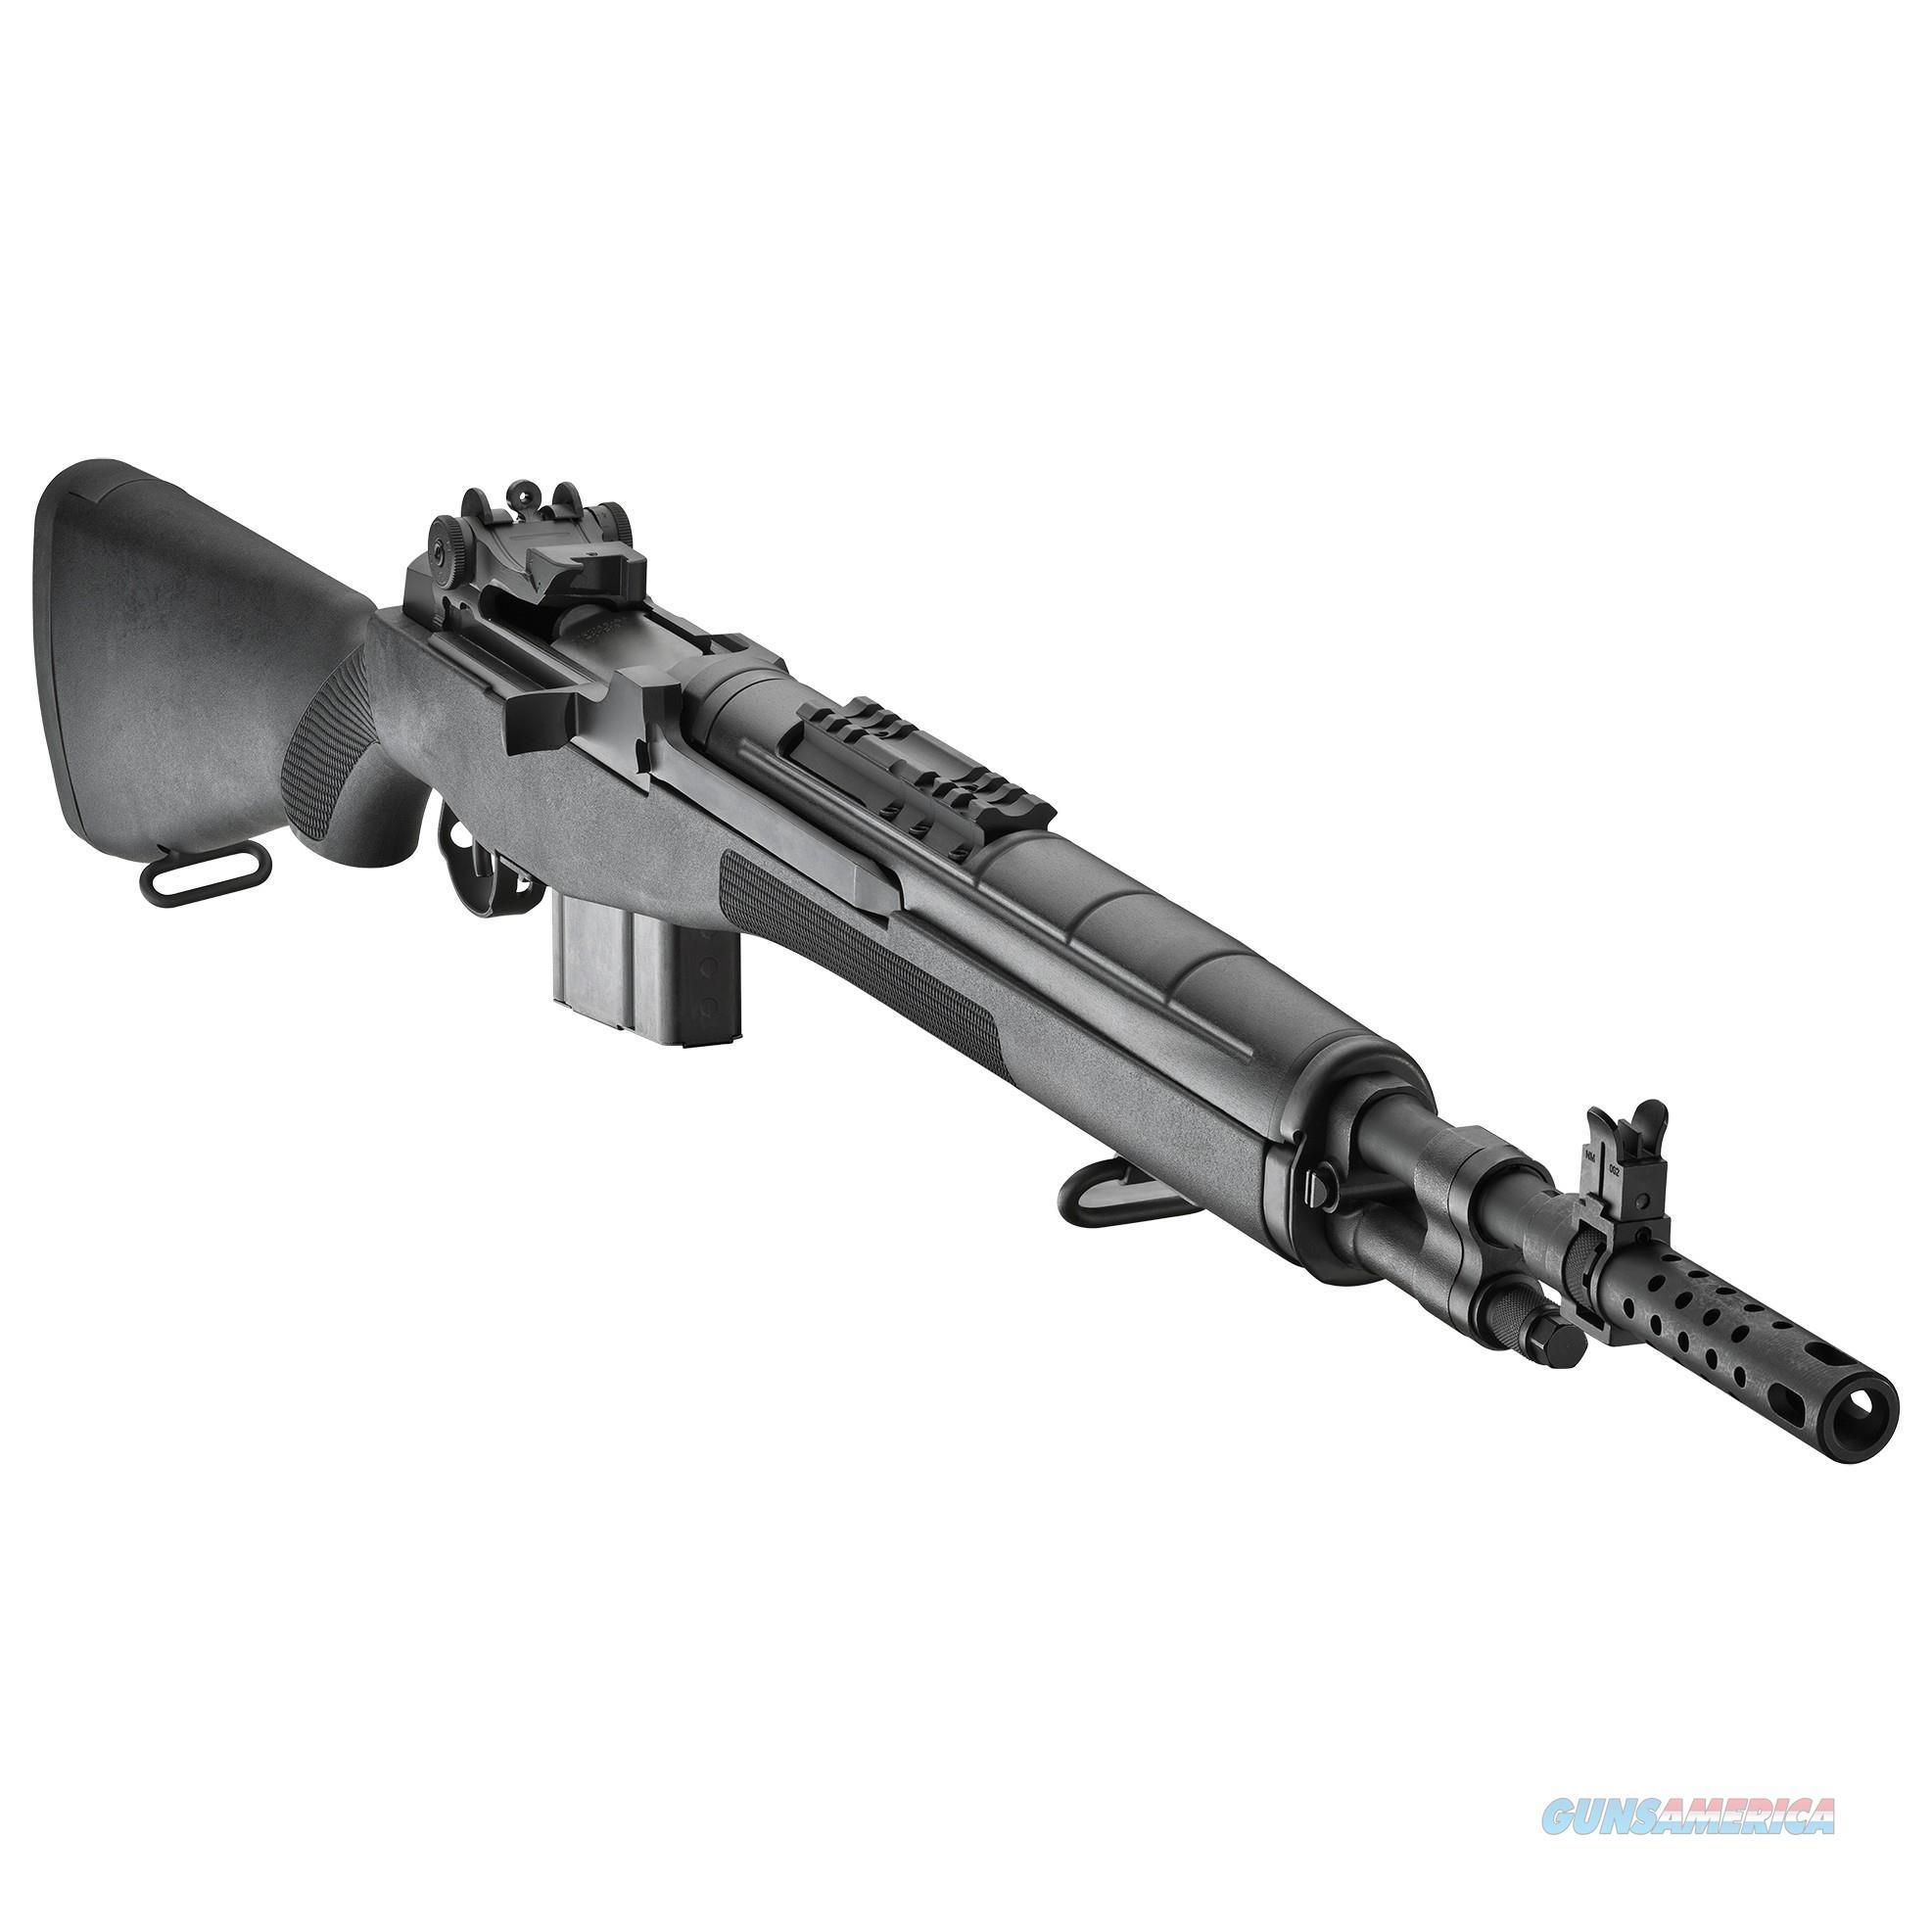 "SPRINGFIELD M1A SCOUT 18"" BARREL  Guns > Rifles > Springfield Armory Rifles > M1A/M14"